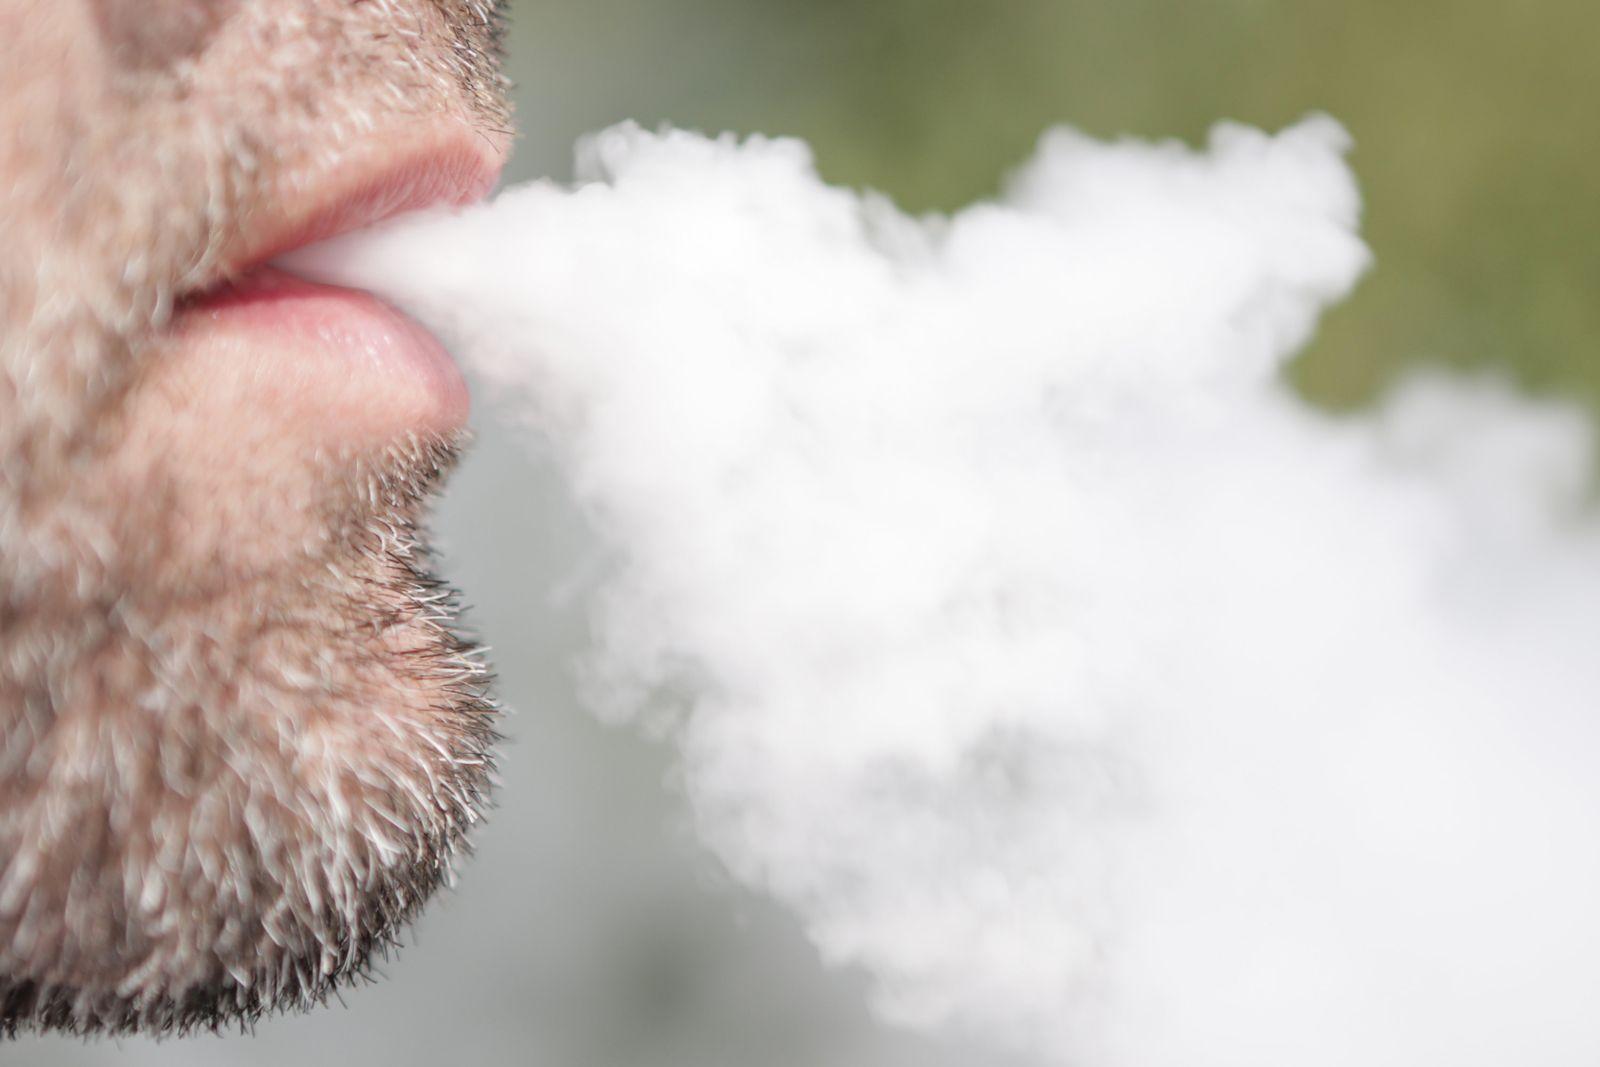 E-Zigarette-Gebrauch